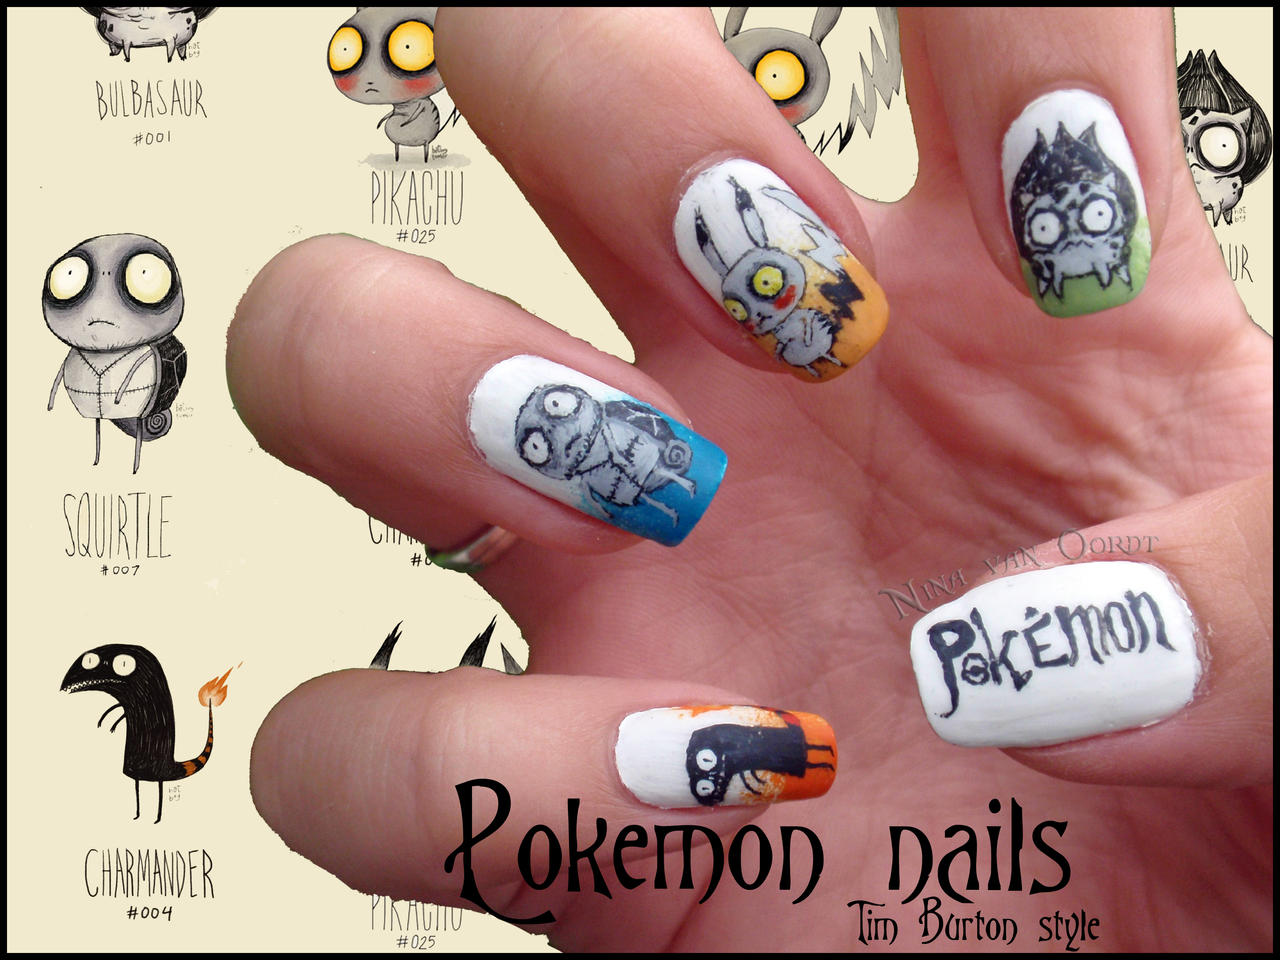 Pokemon Tim Burton Style Nails by Ninails on DeviantArt